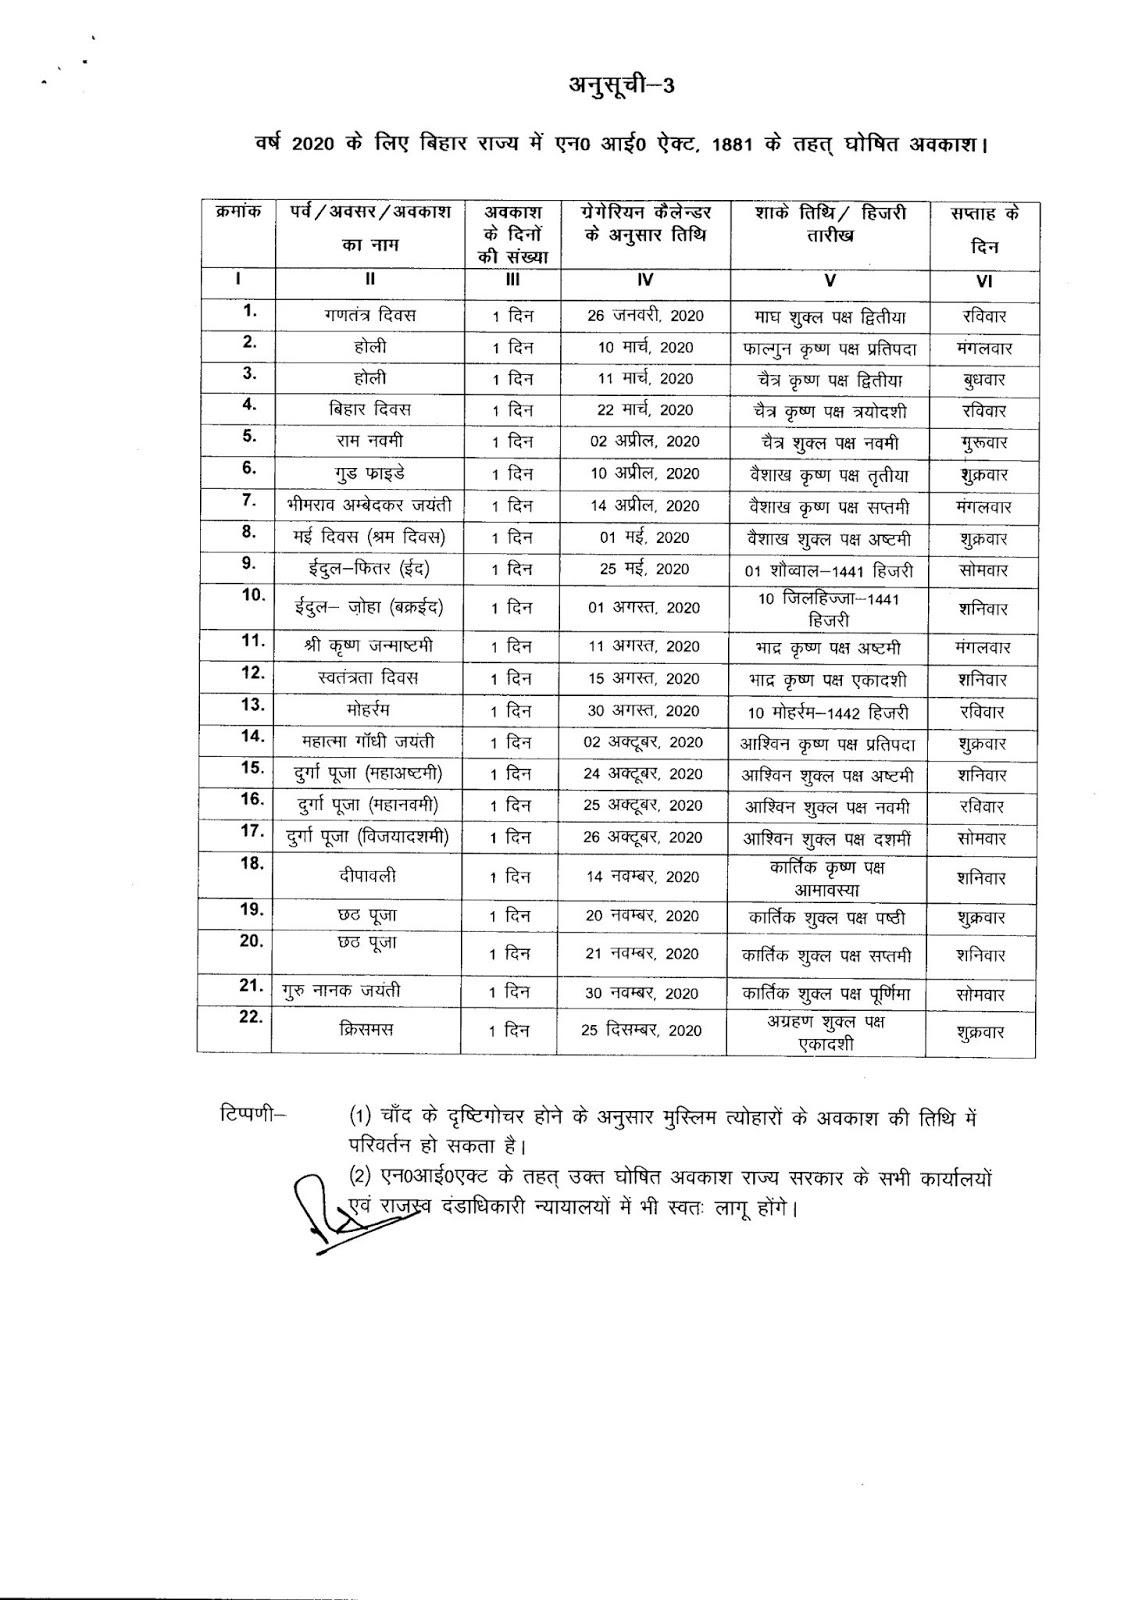 Bihar Government Calendar 2020 #educratsweb intended for Bihar Govt Calendar 2020 Pdf